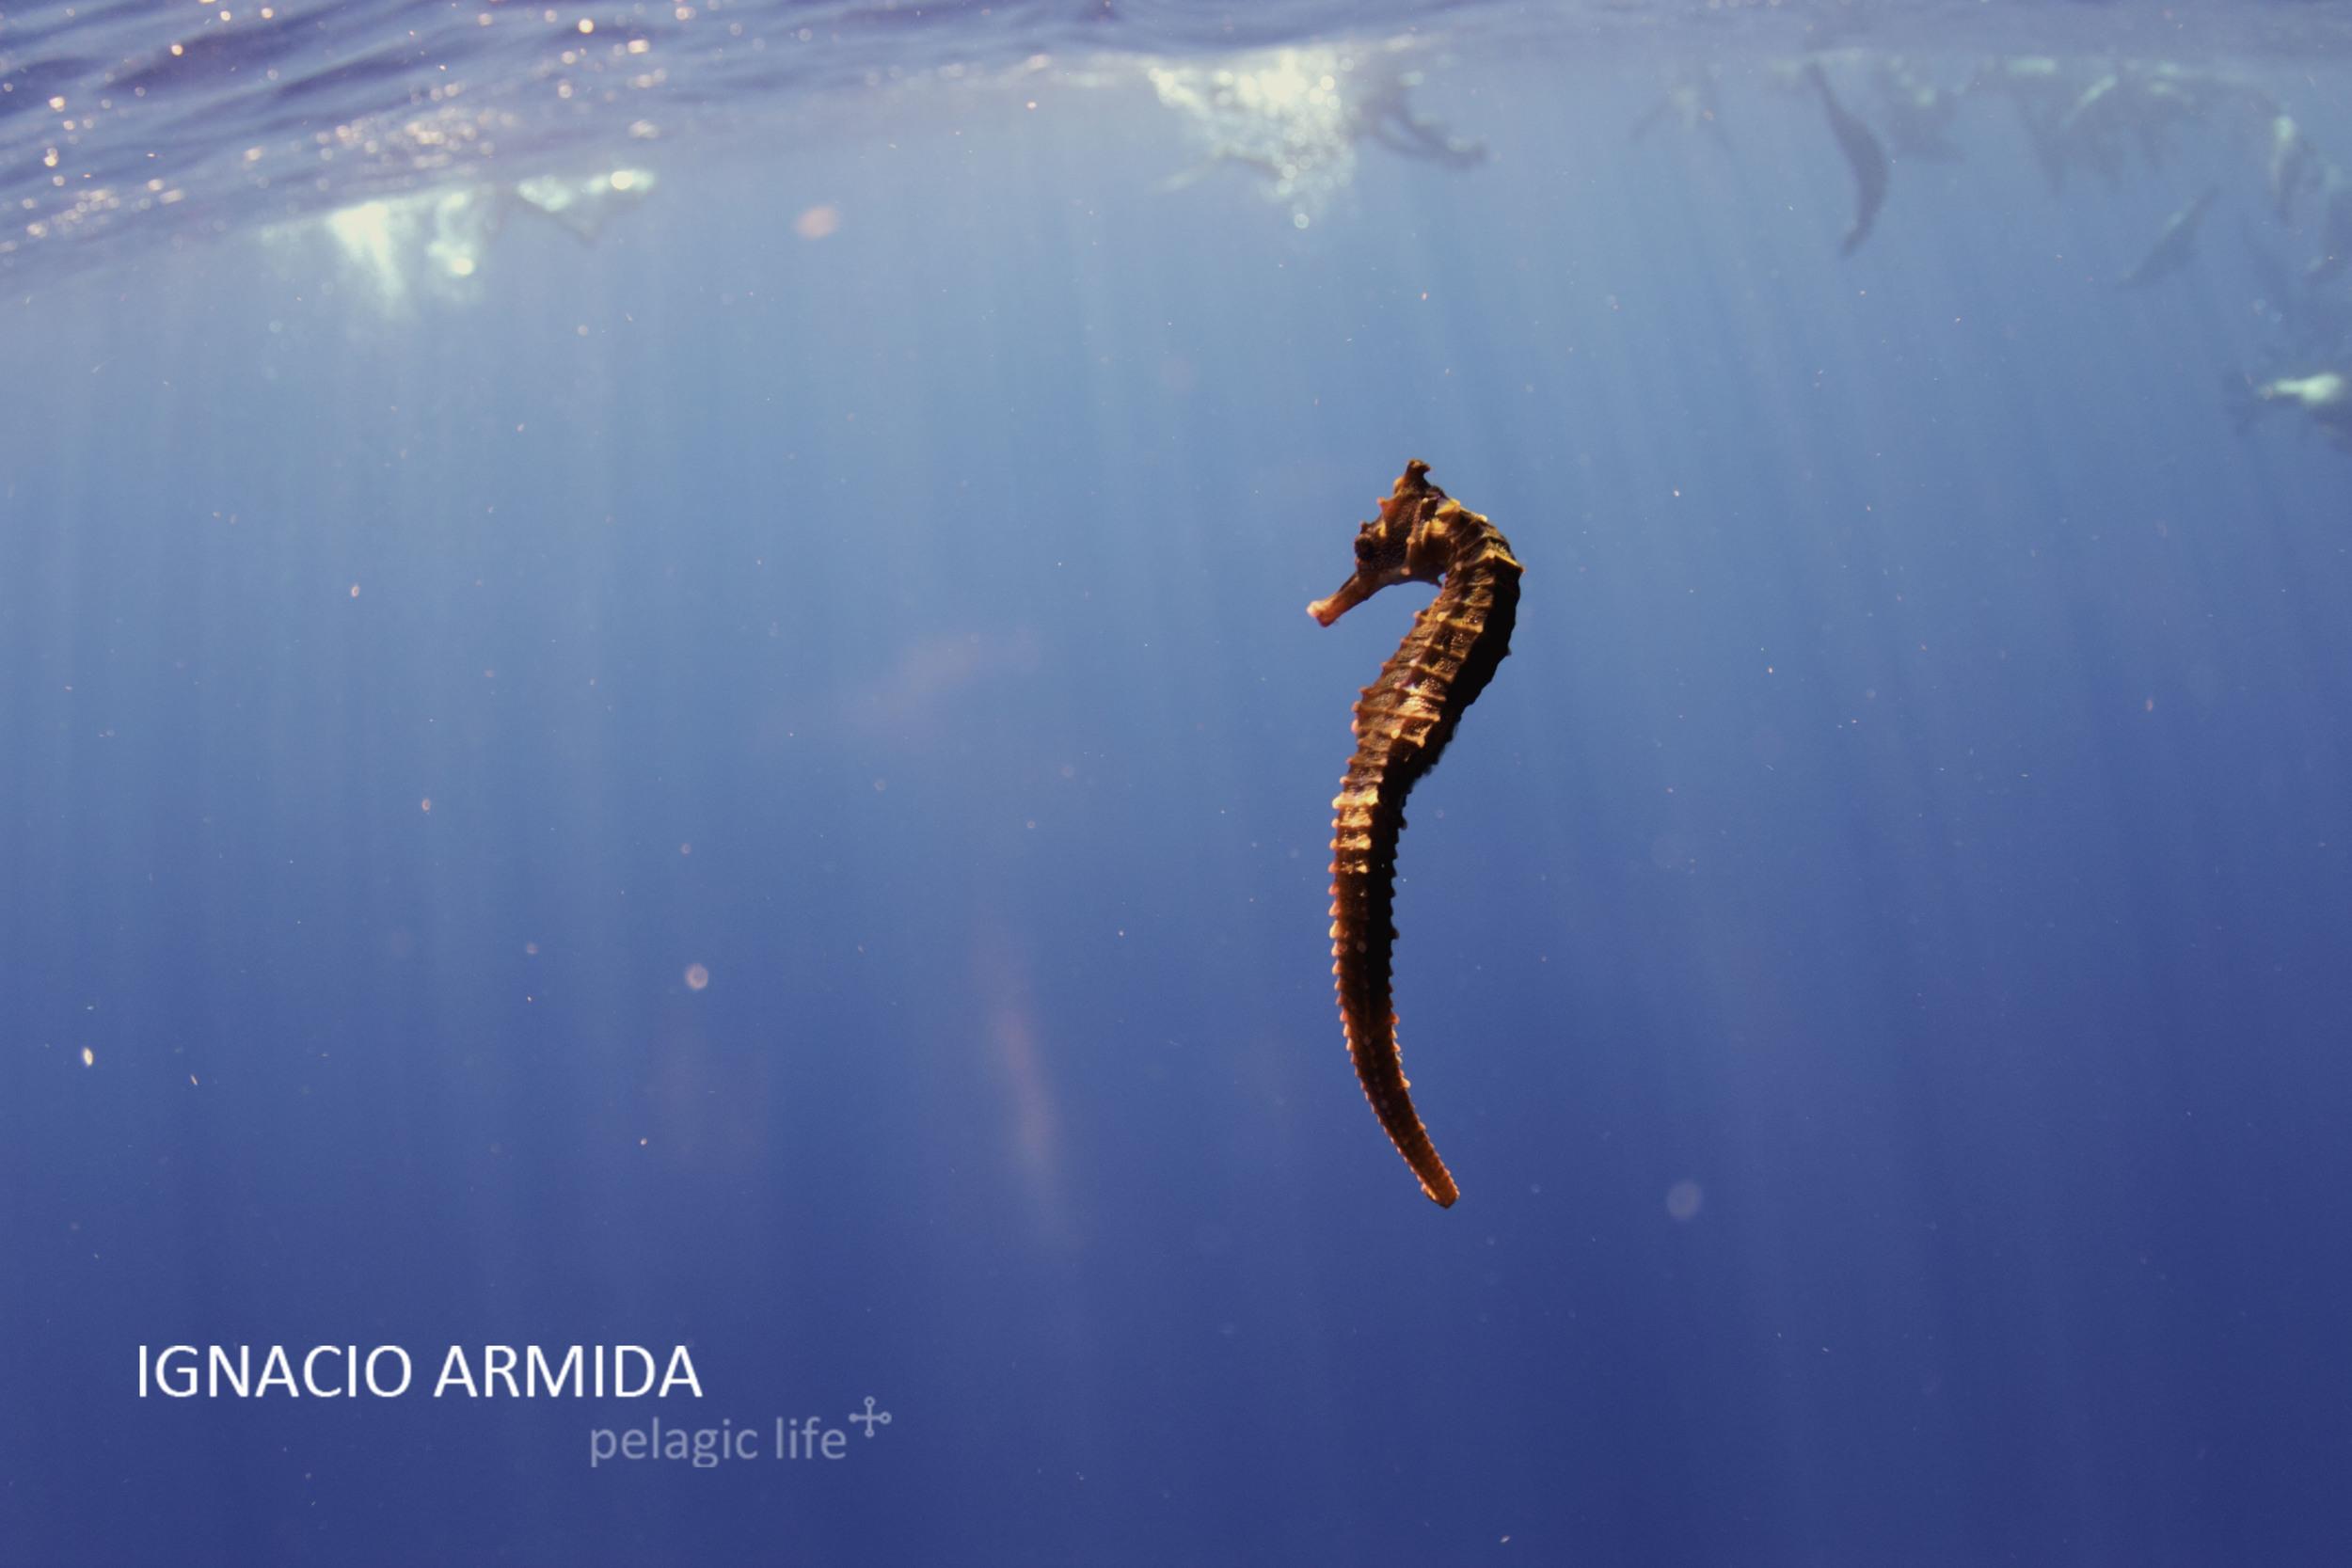 Ignacio Armida ©